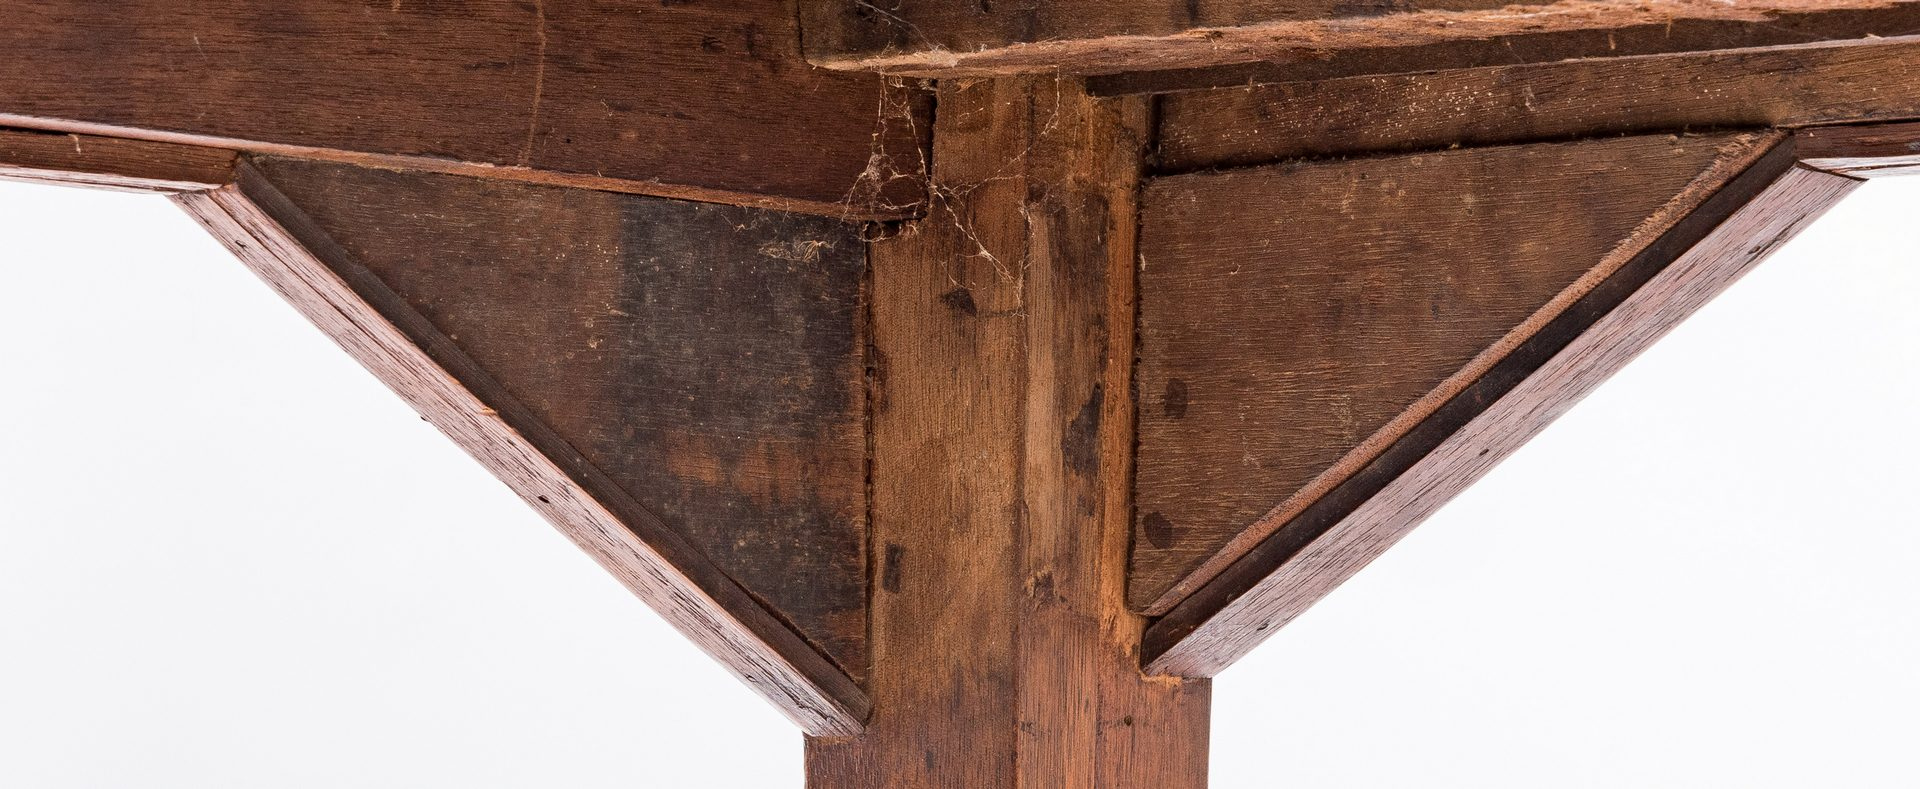 Lot 456: East TN Inlaid Hepplewhite Walnut Sideboard